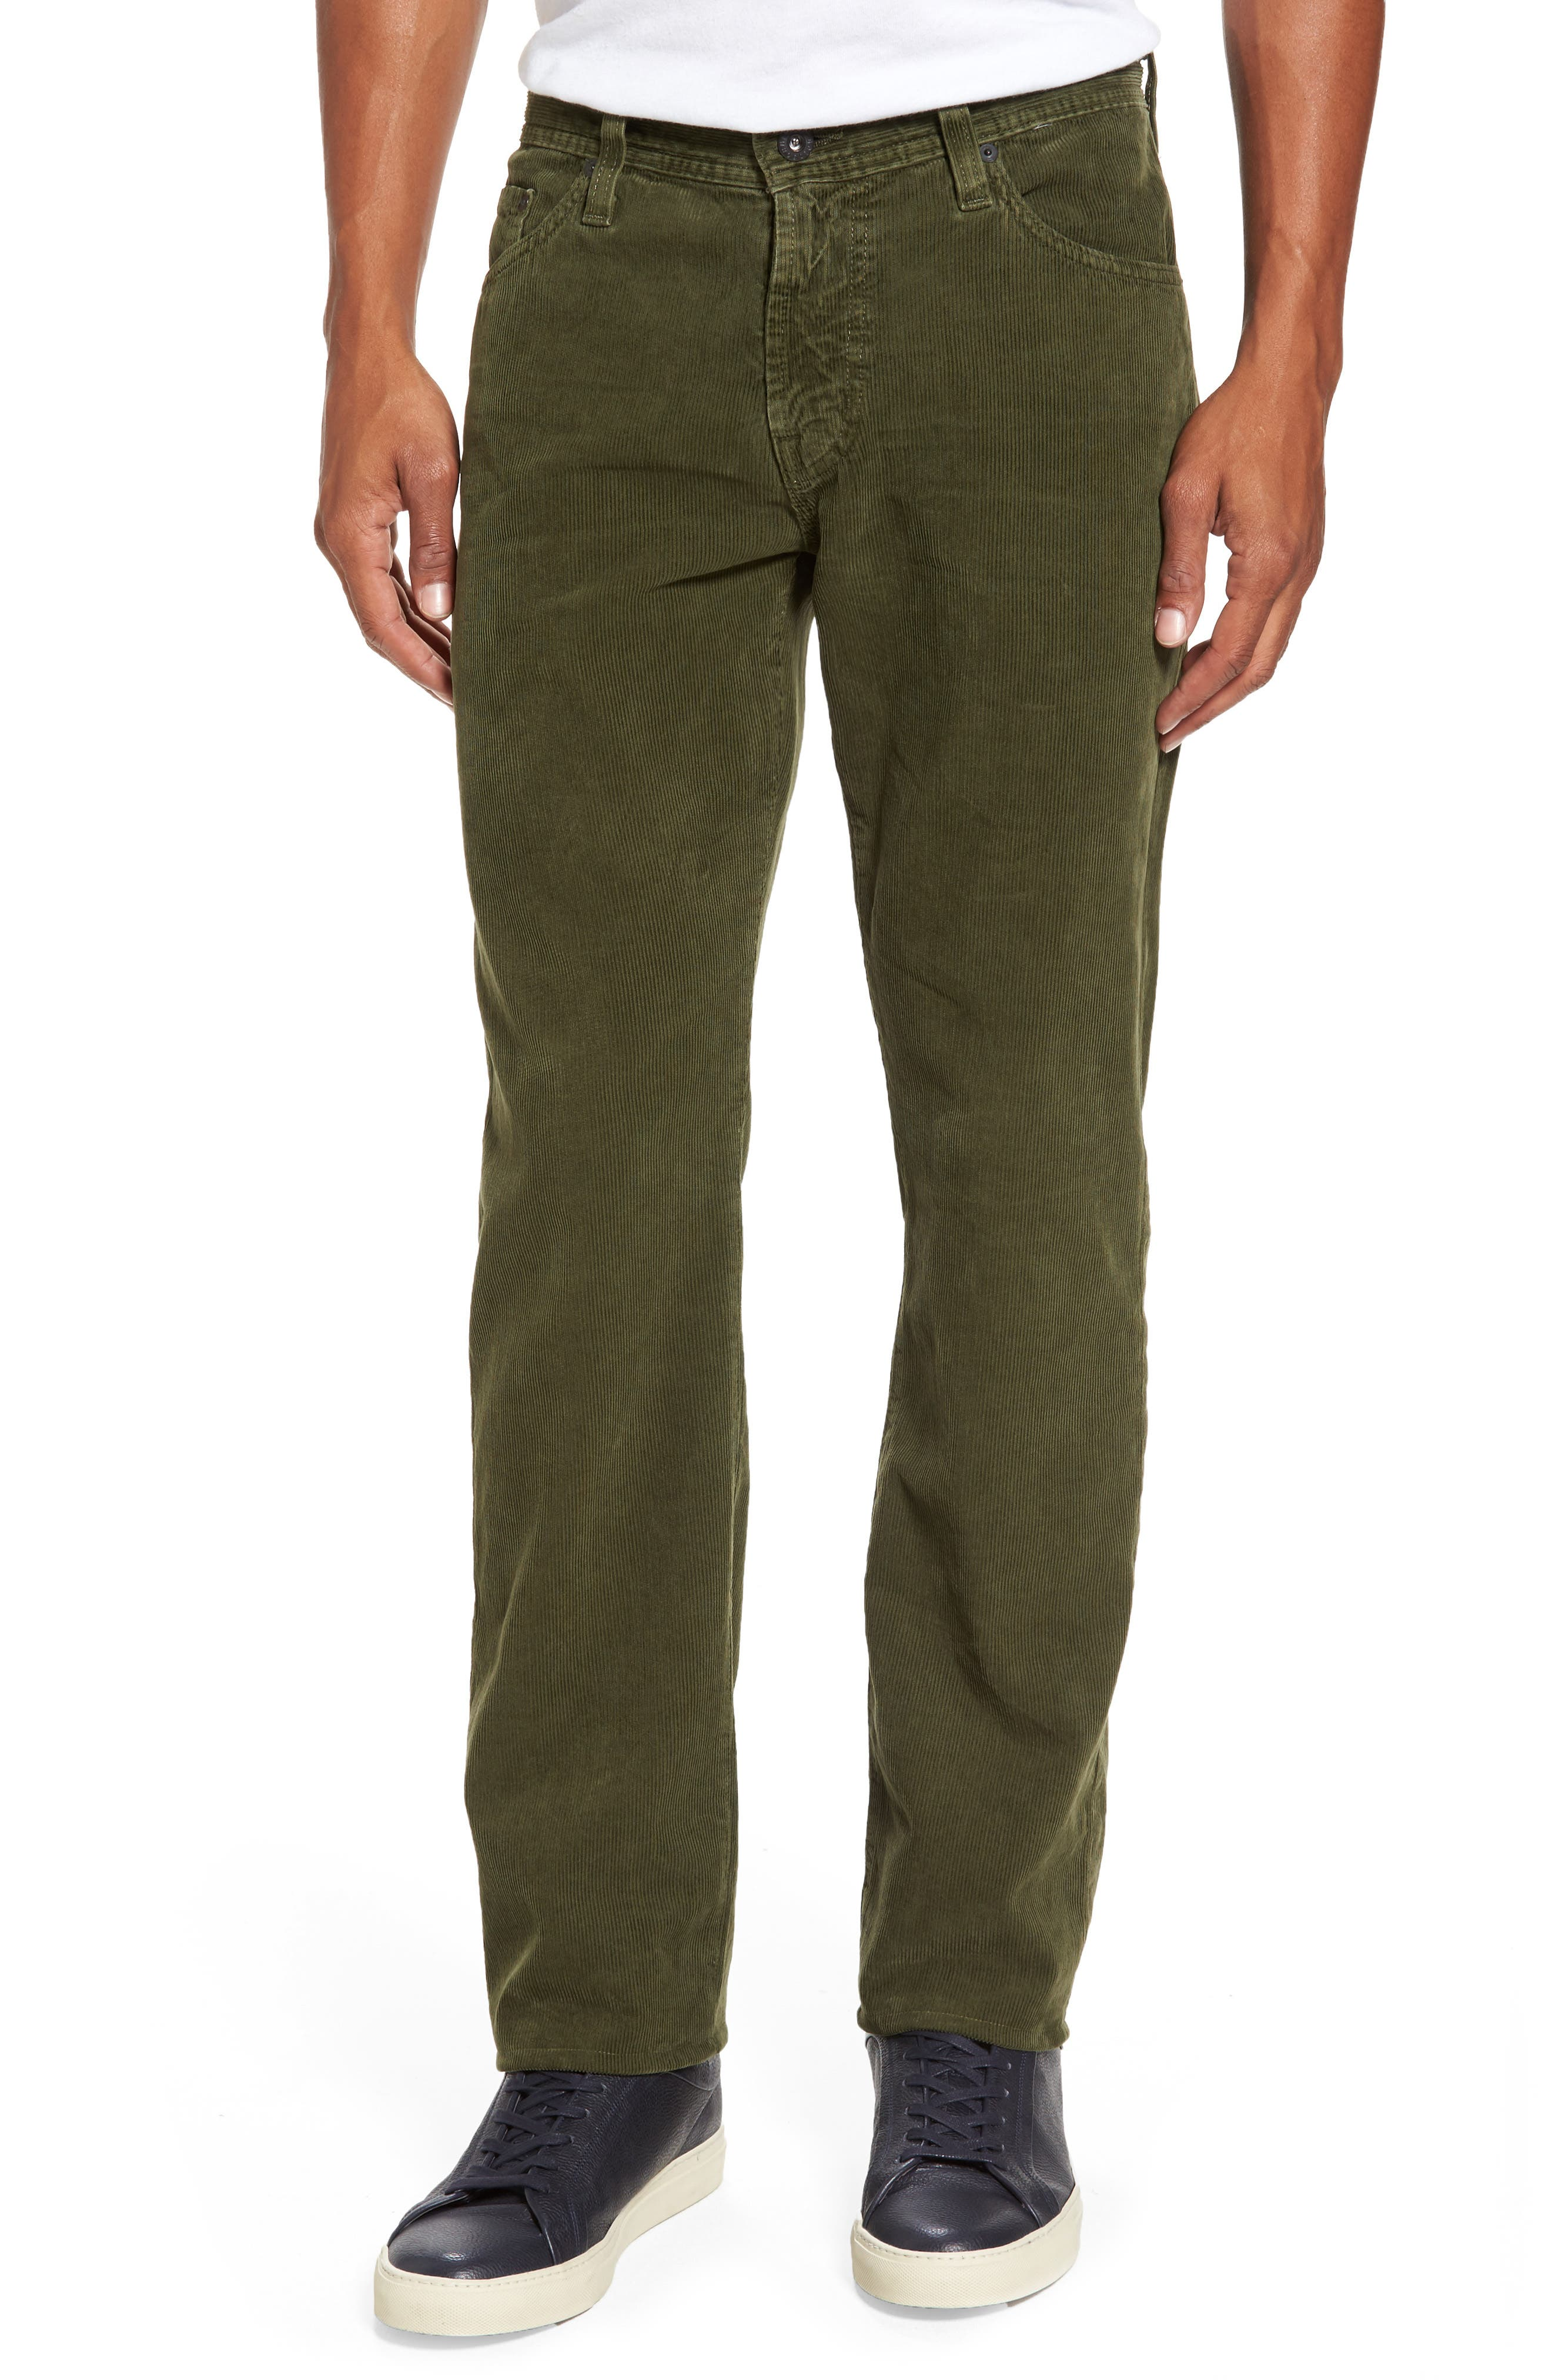 'Graduate' Tailored Straight Leg Corduroy Pants,                             Main thumbnail 1, color,                             Sulfur Climbing Ivy